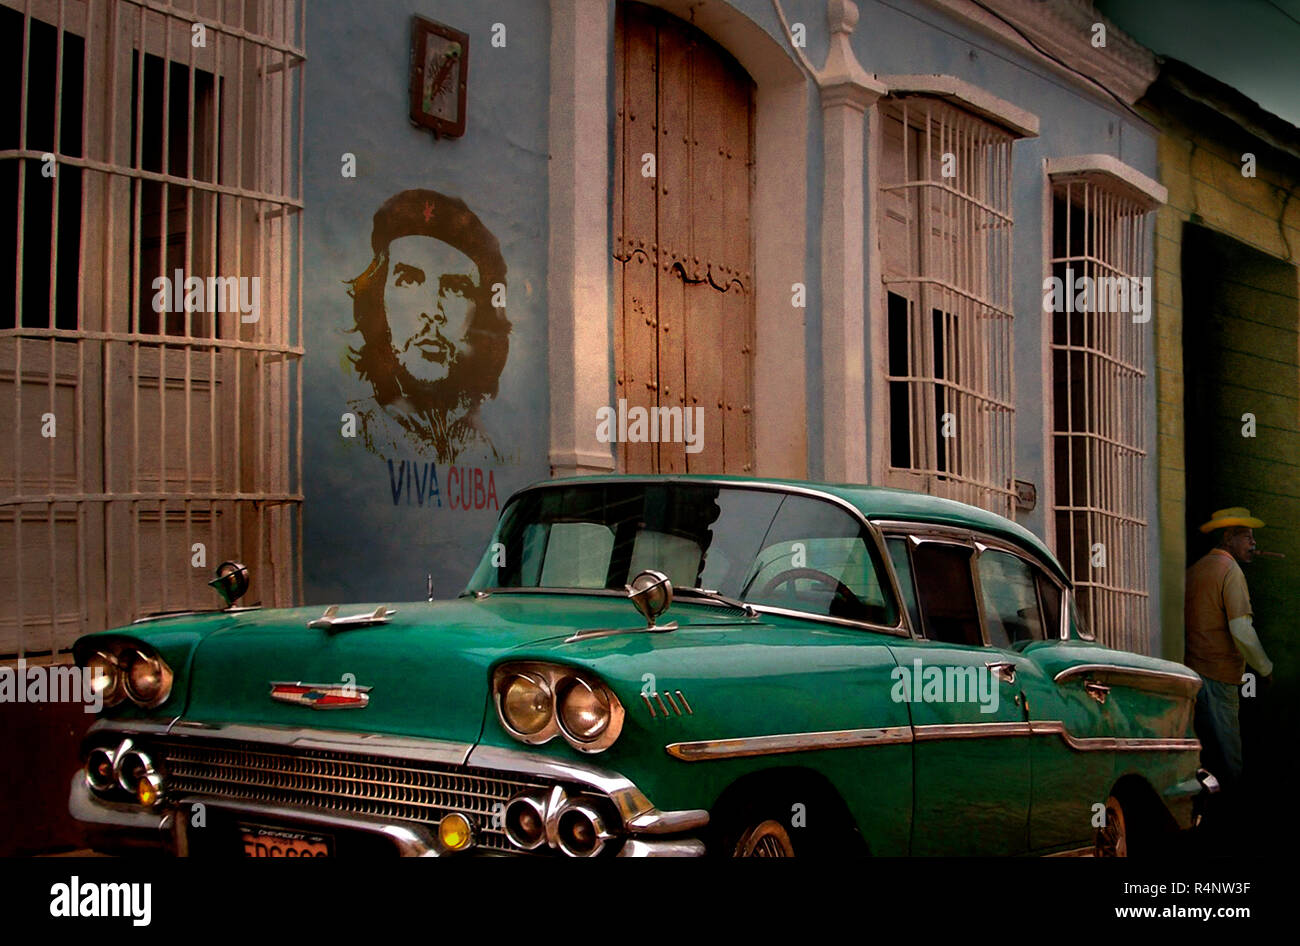 Vintage car and graffiti of Che Guevara in street, Trinidad, SanctiSpritusProvince, Cuba Stock Photo